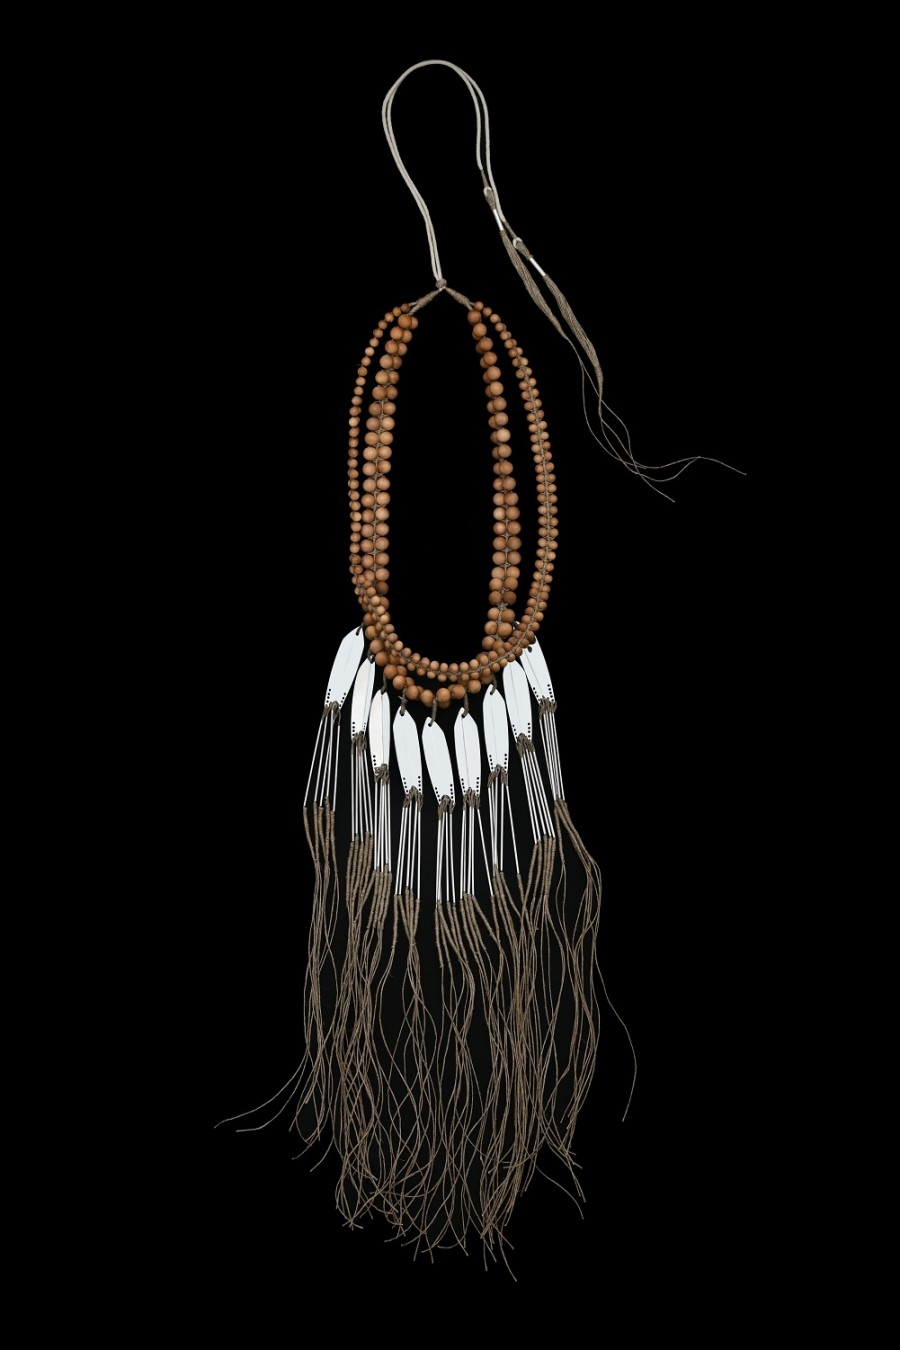 Sandalwoods big beads, stainless steel and jute tassels